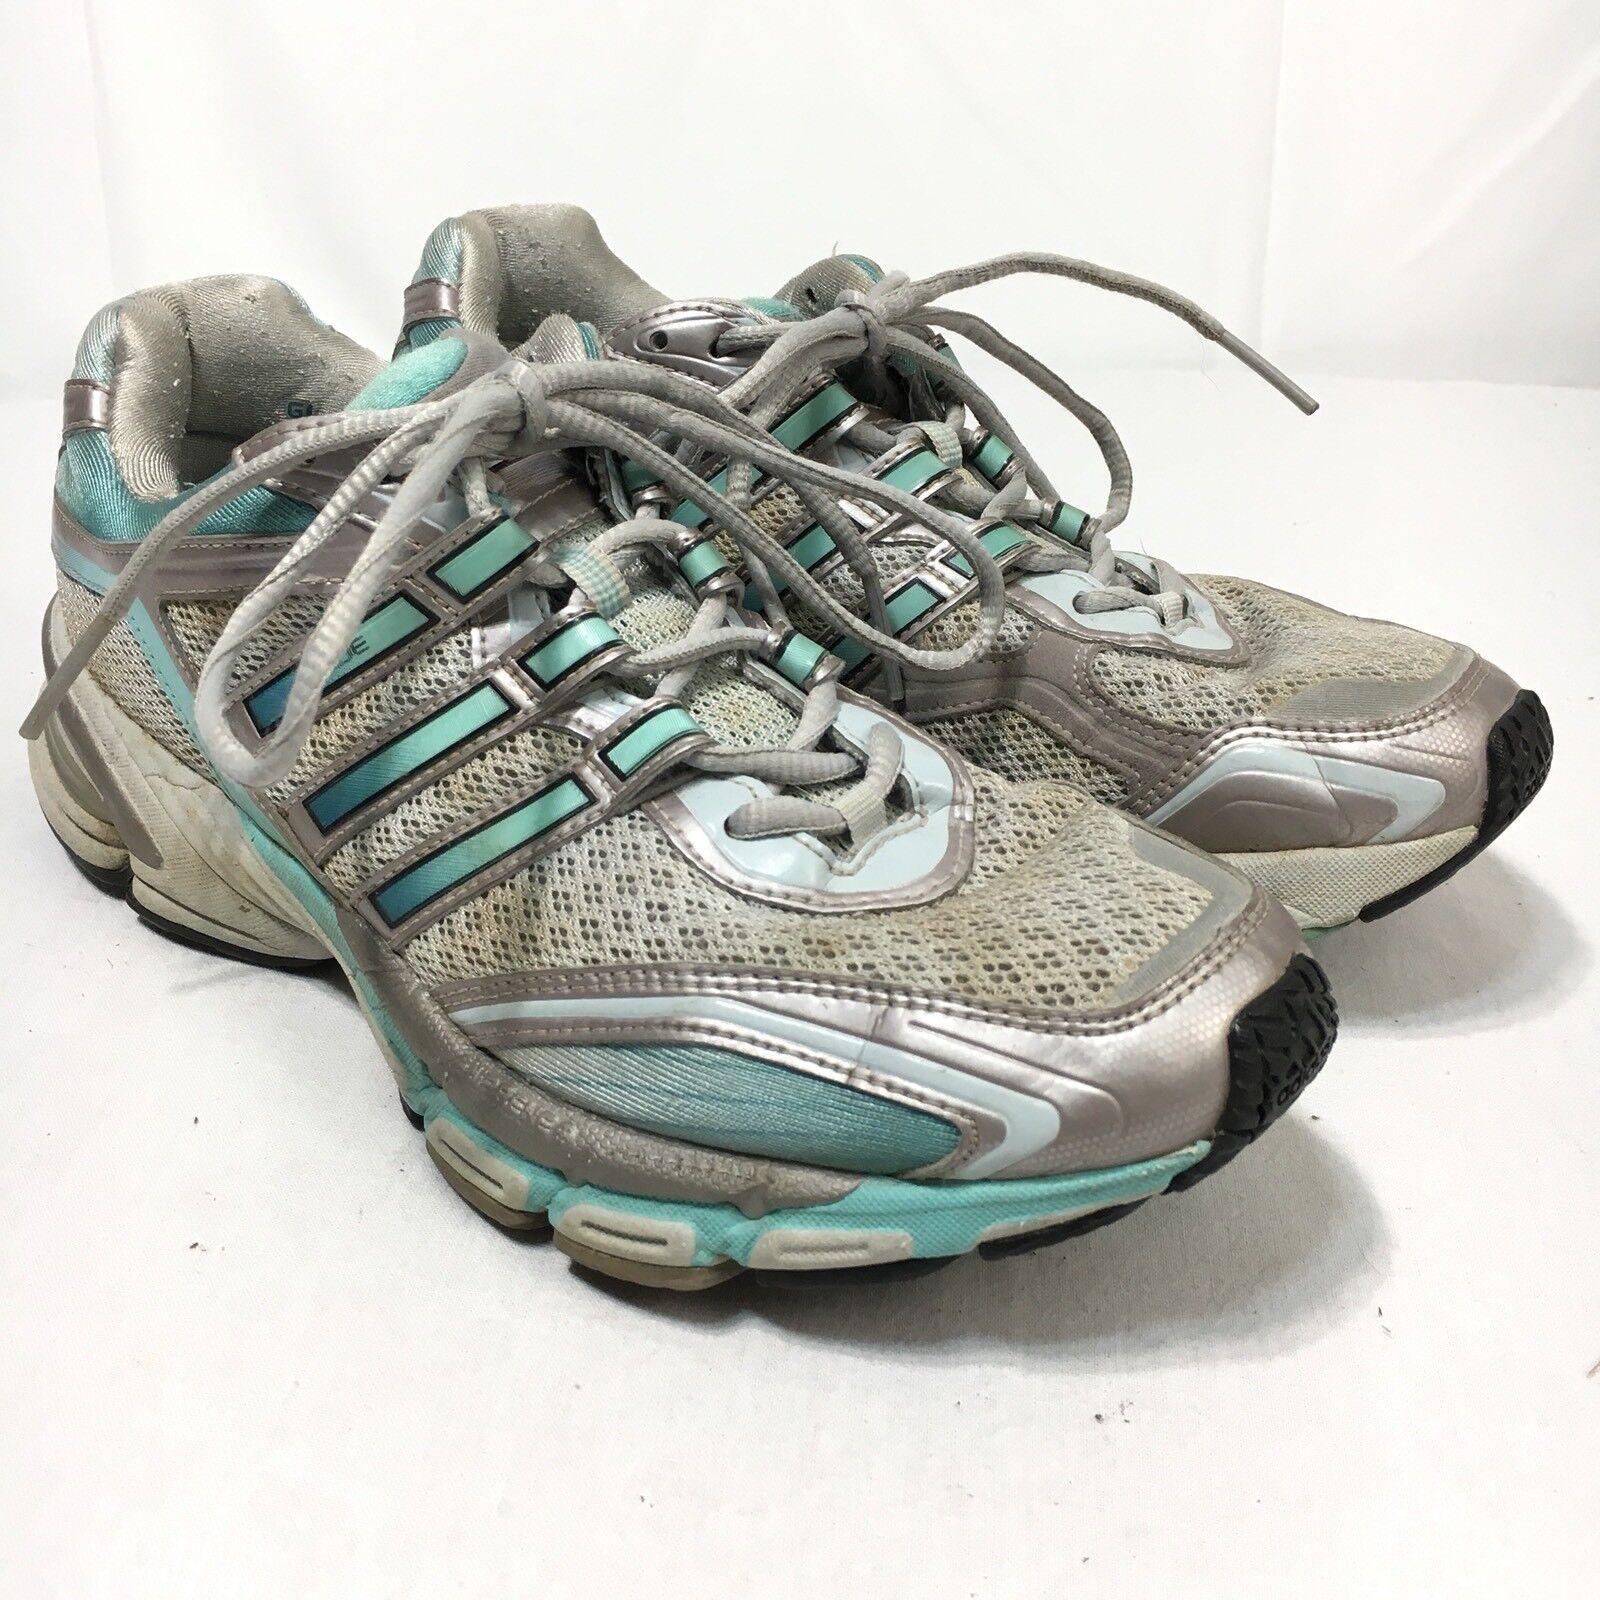 Adidas adiprene supernova glide donne 8,5 argentoo blu atletico scarpe da corsa | Funzione speciale  | Uomini/Donne Scarpa